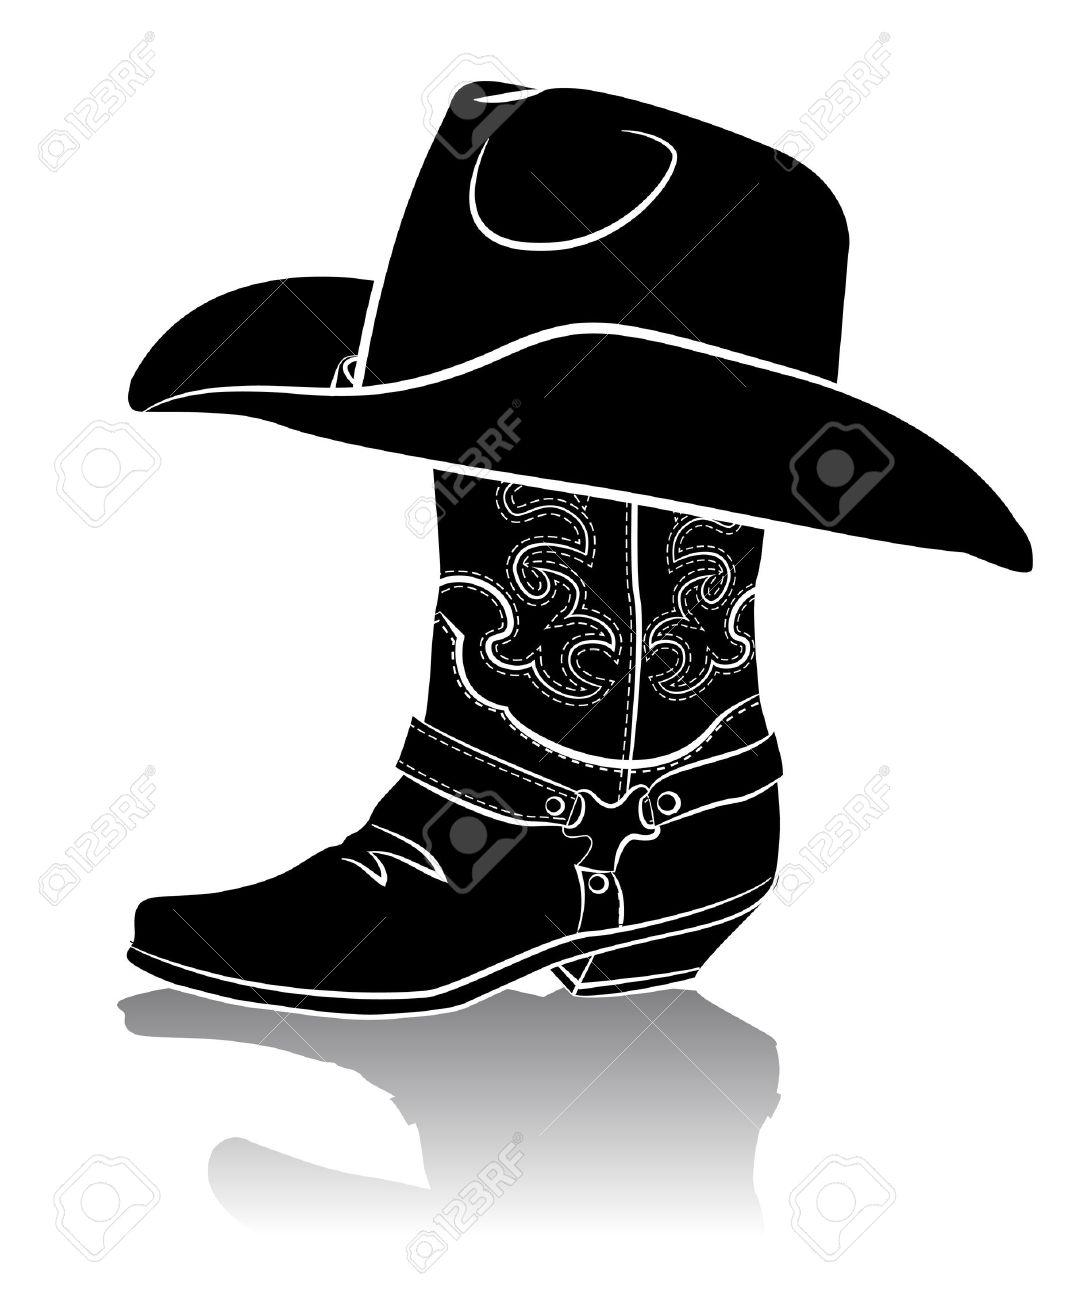 7,600 Cowboy Hat Cliparts, Stock Vector And Royalty Free Cowboy ...